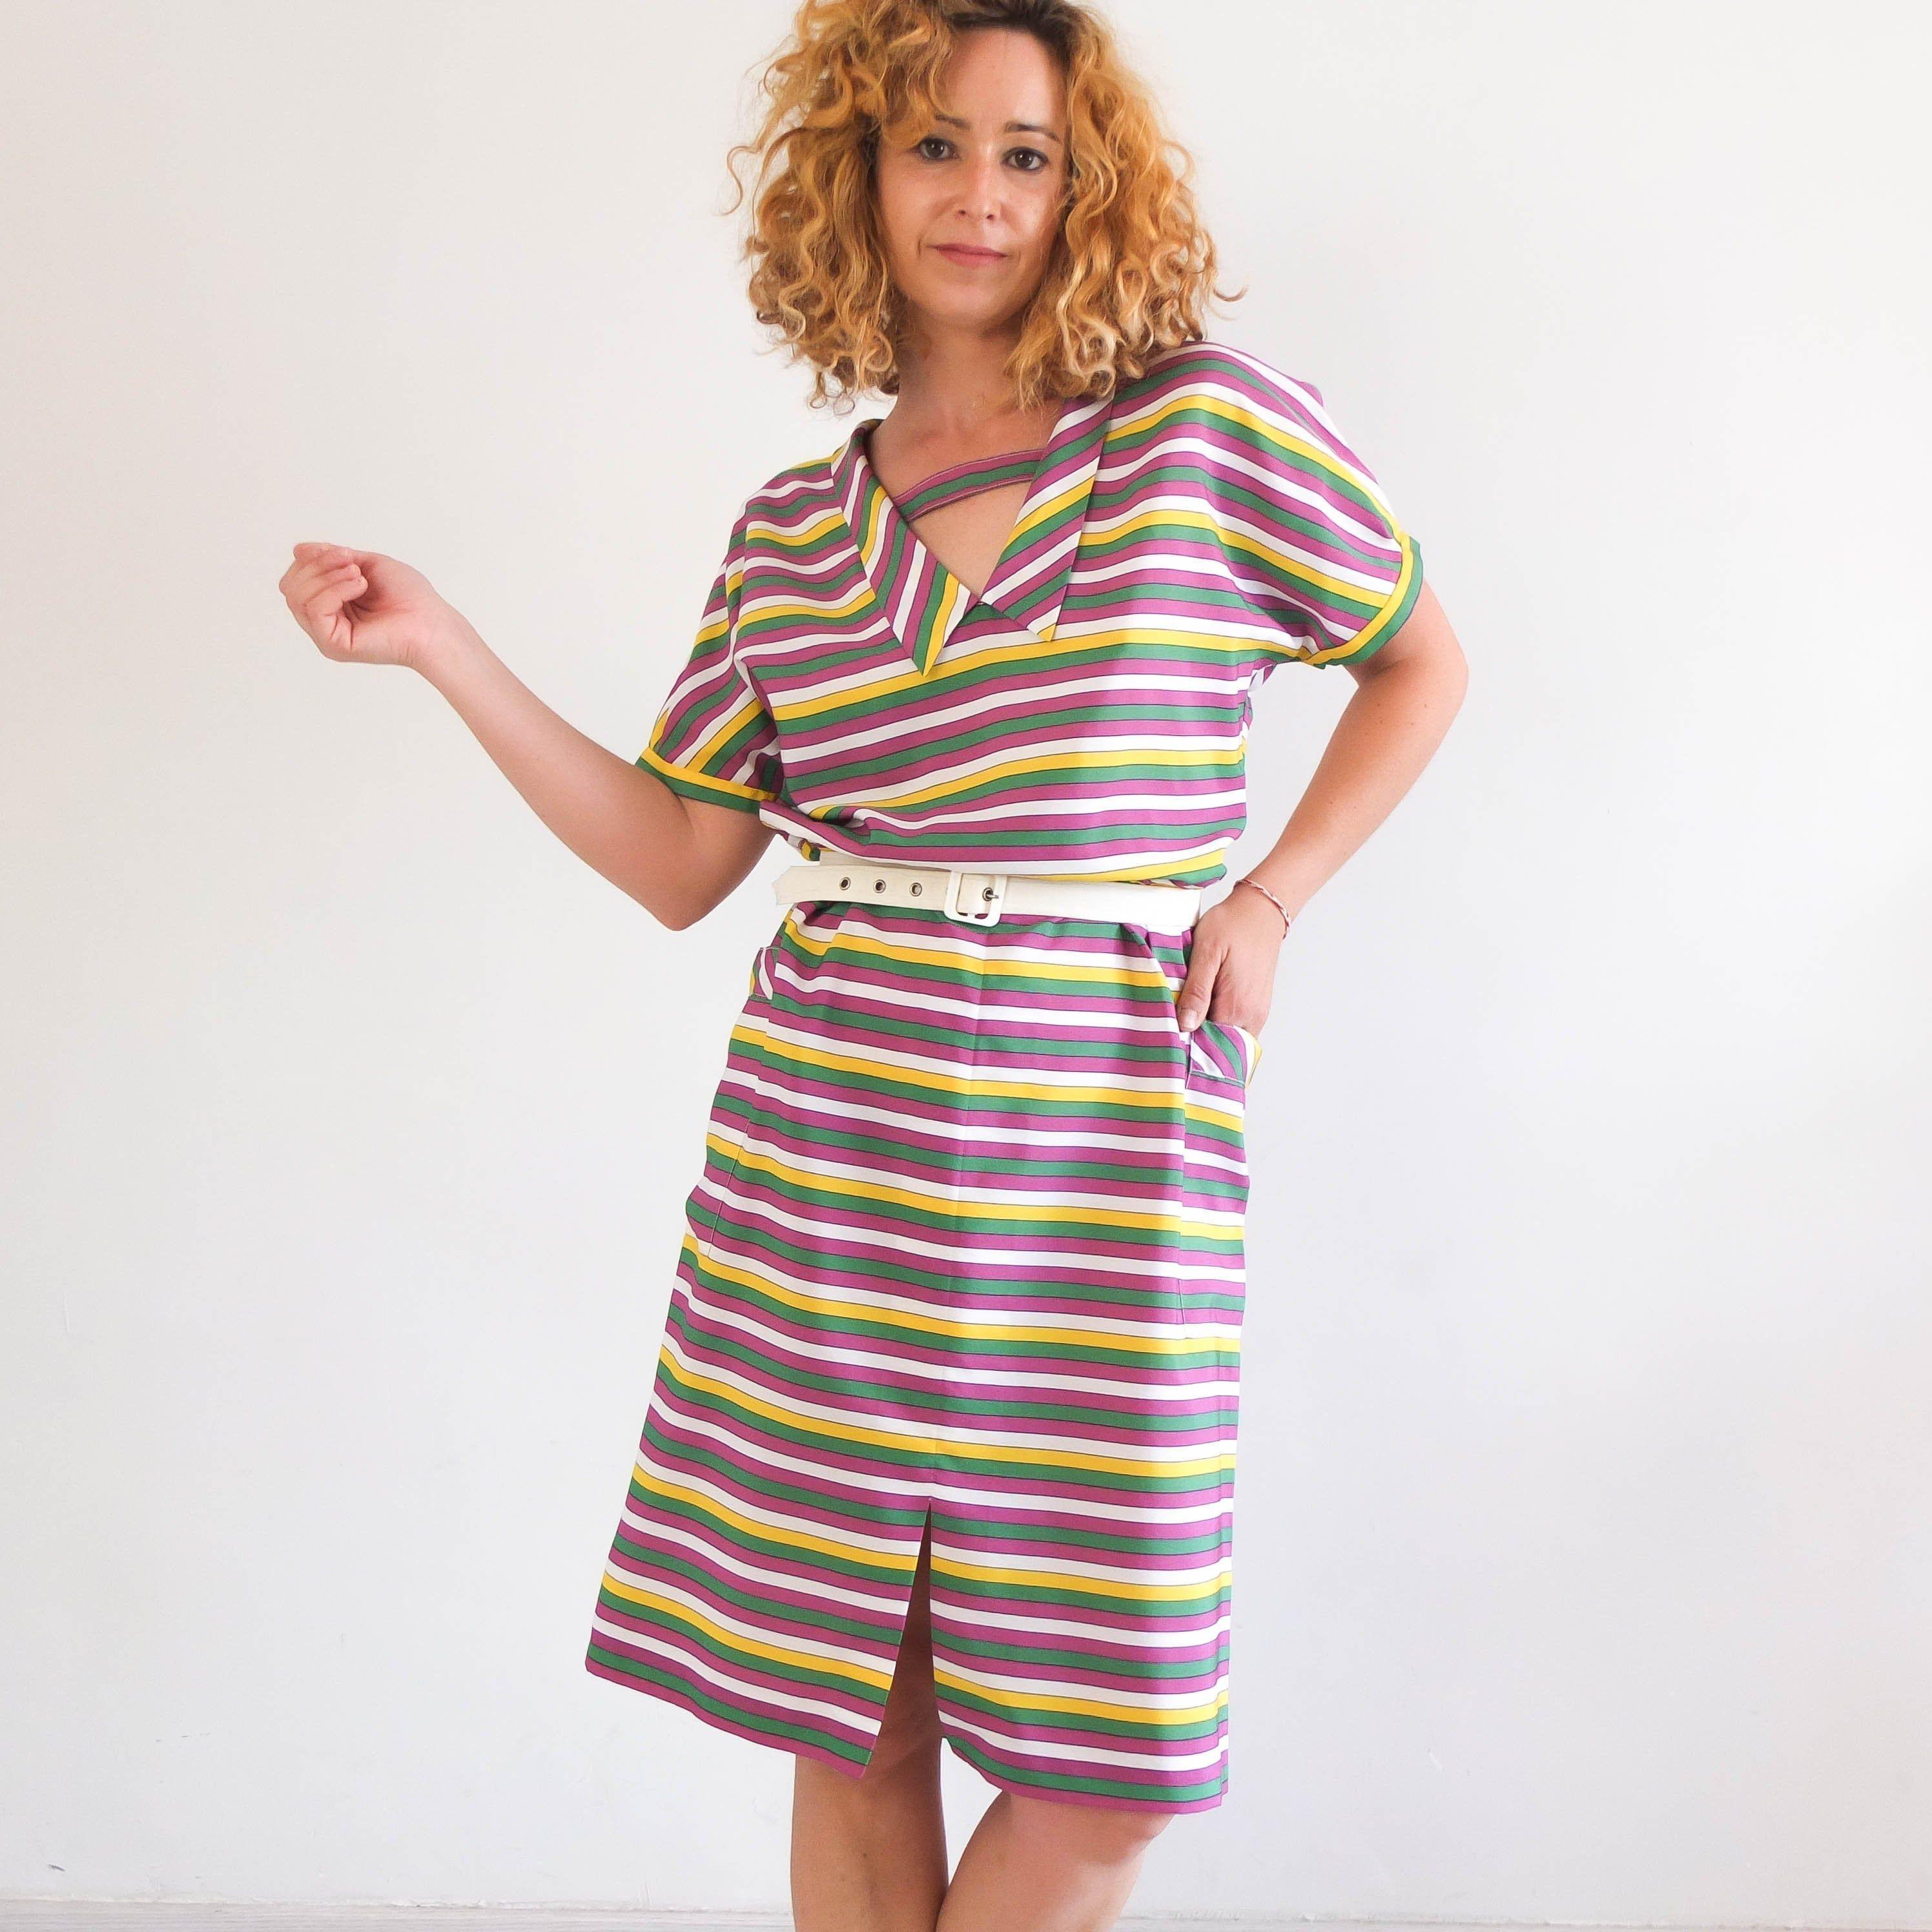 Vintage Rainbow Dress Vintage Colorful Striped Dress 70s 80s Summer Day Dress Orange Green Purple Stripe Dres Striped Dress Summer Day Dresses Rainbow Dress [ 2992 x 2992 Pixel ]